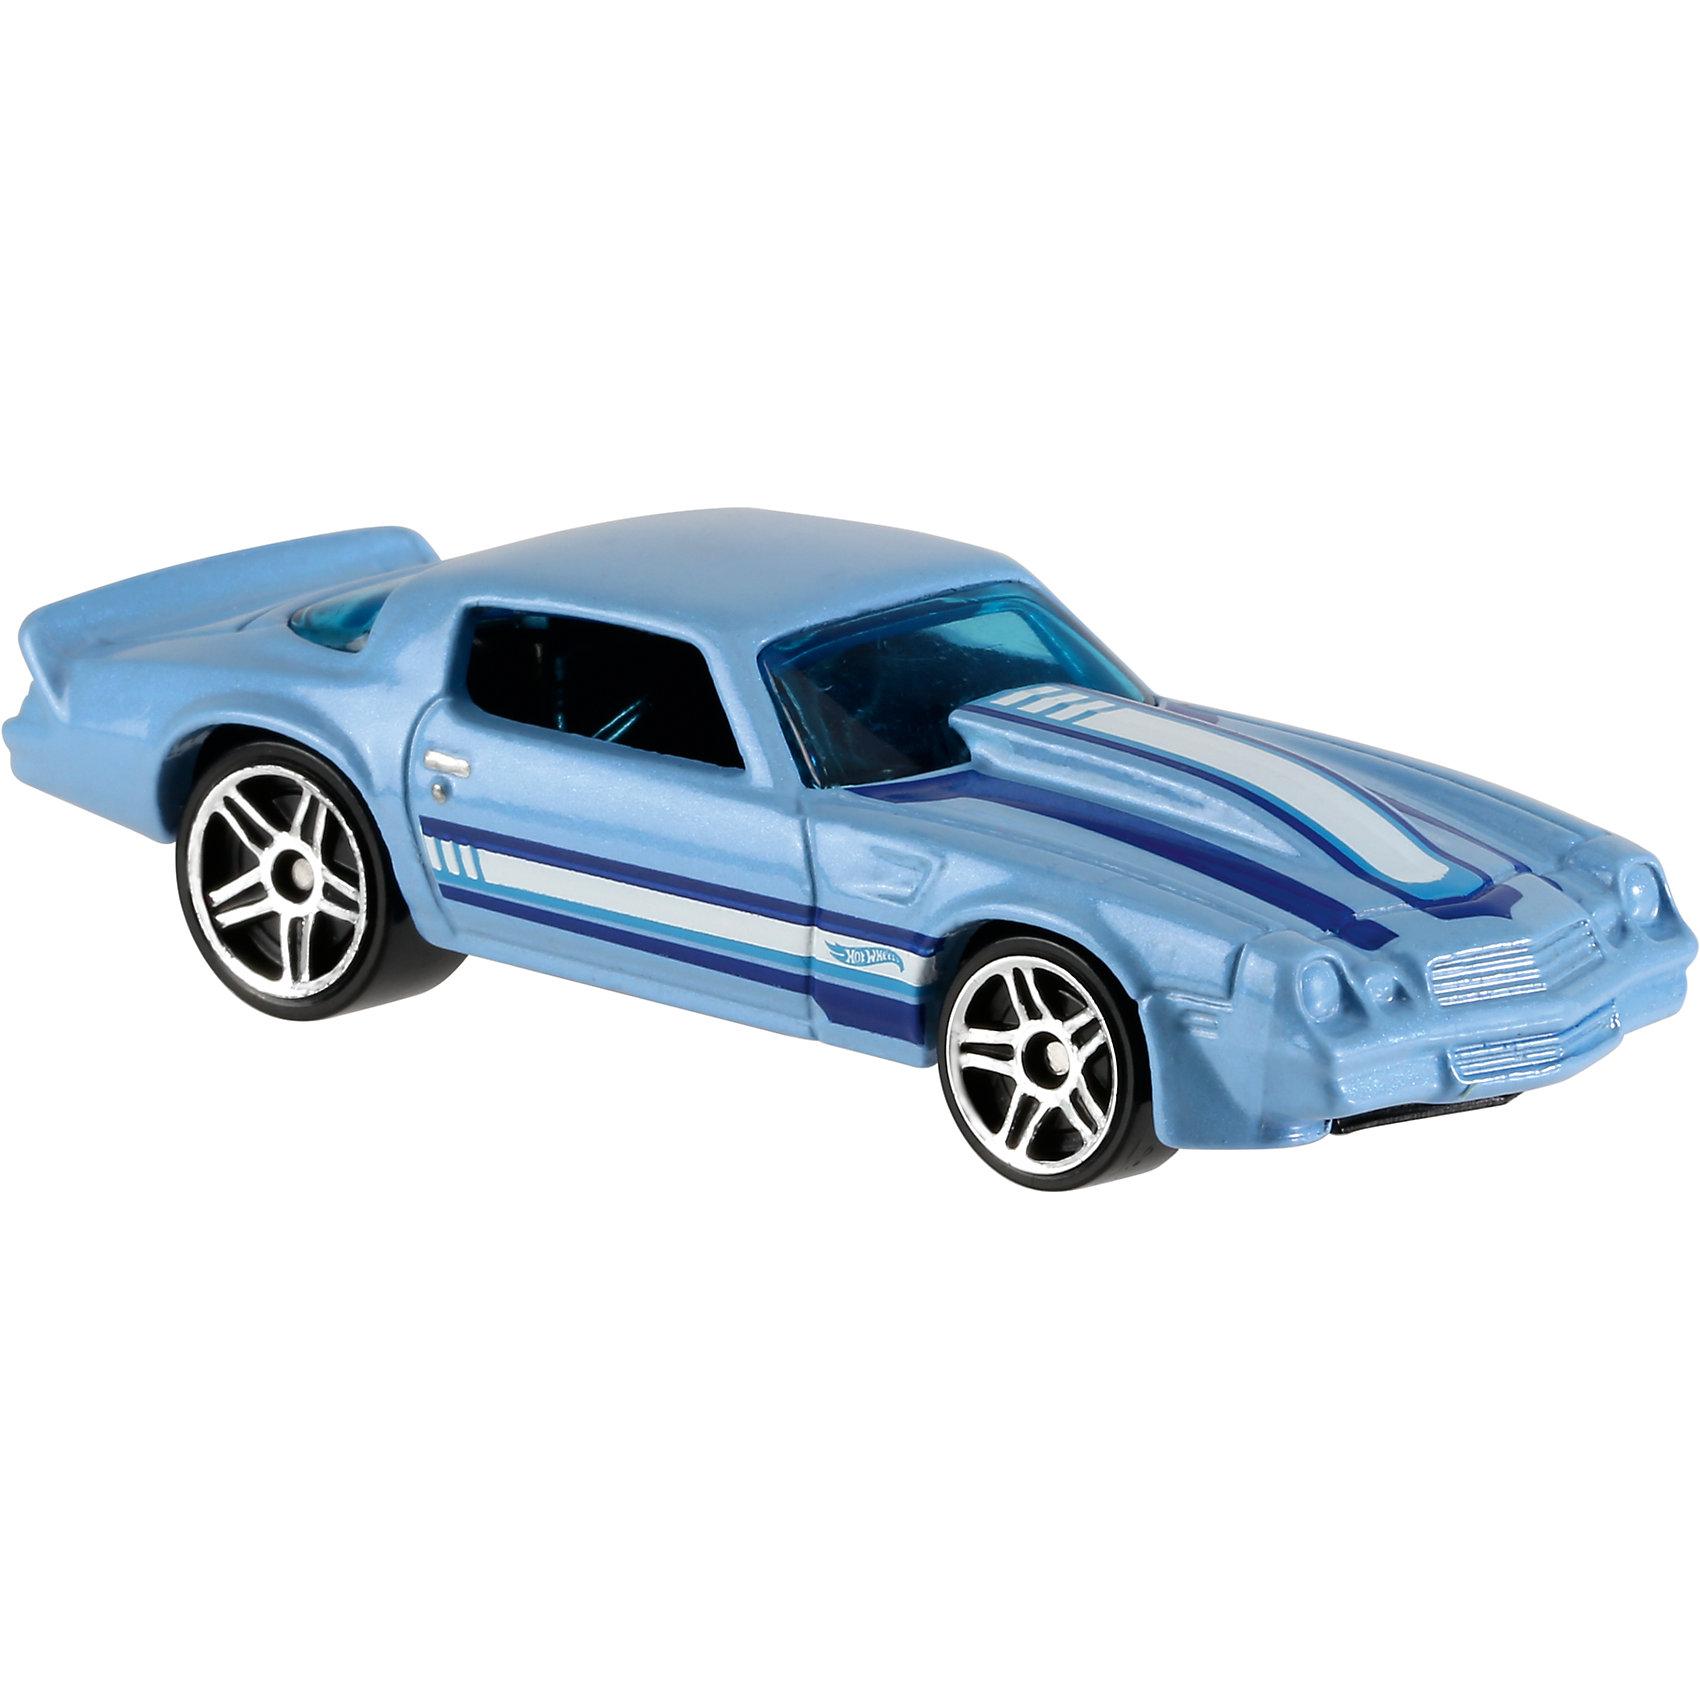 Базовая машинка Hot Wheels, 81 CamaroМашинки<br><br><br>Ширина мм: 110<br>Глубина мм: 45<br>Высота мм: 110<br>Вес г: 30<br>Возраст от месяцев: 36<br>Возраст до месяцев: 96<br>Пол: Мужской<br>Возраст: Детский<br>SKU: 7111085